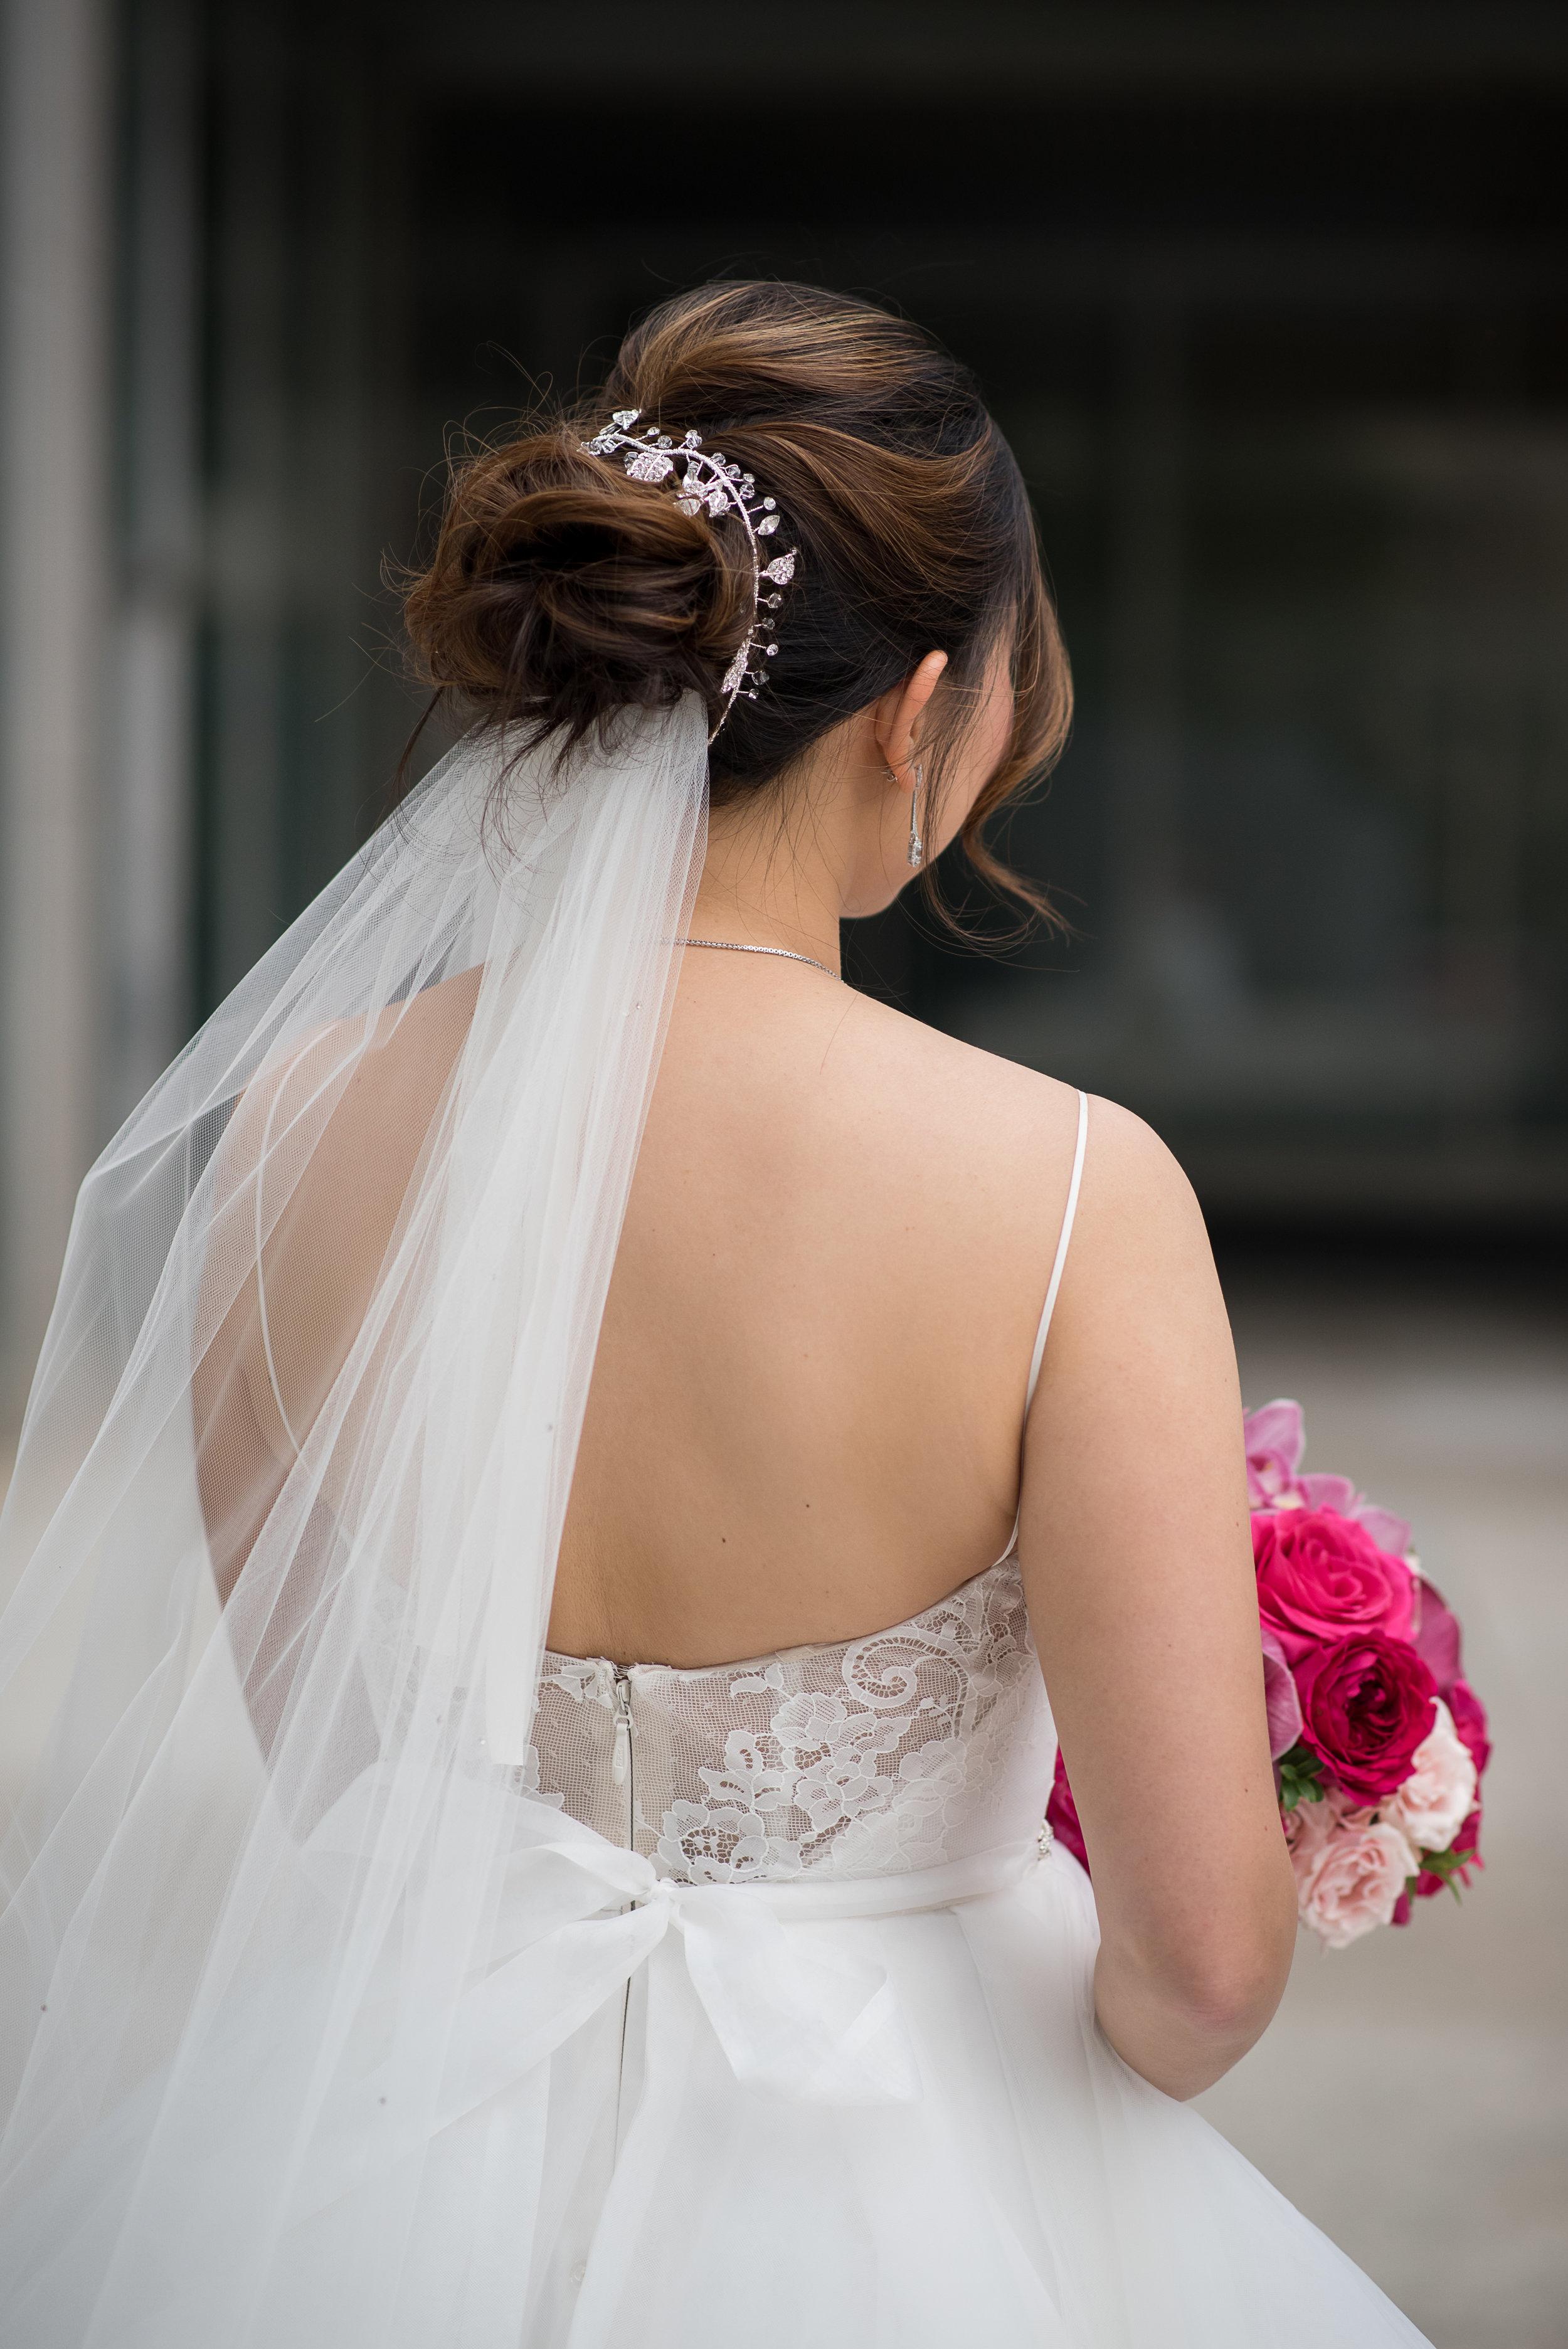 Hair: Ashley - Photographer: Photographik Weddings